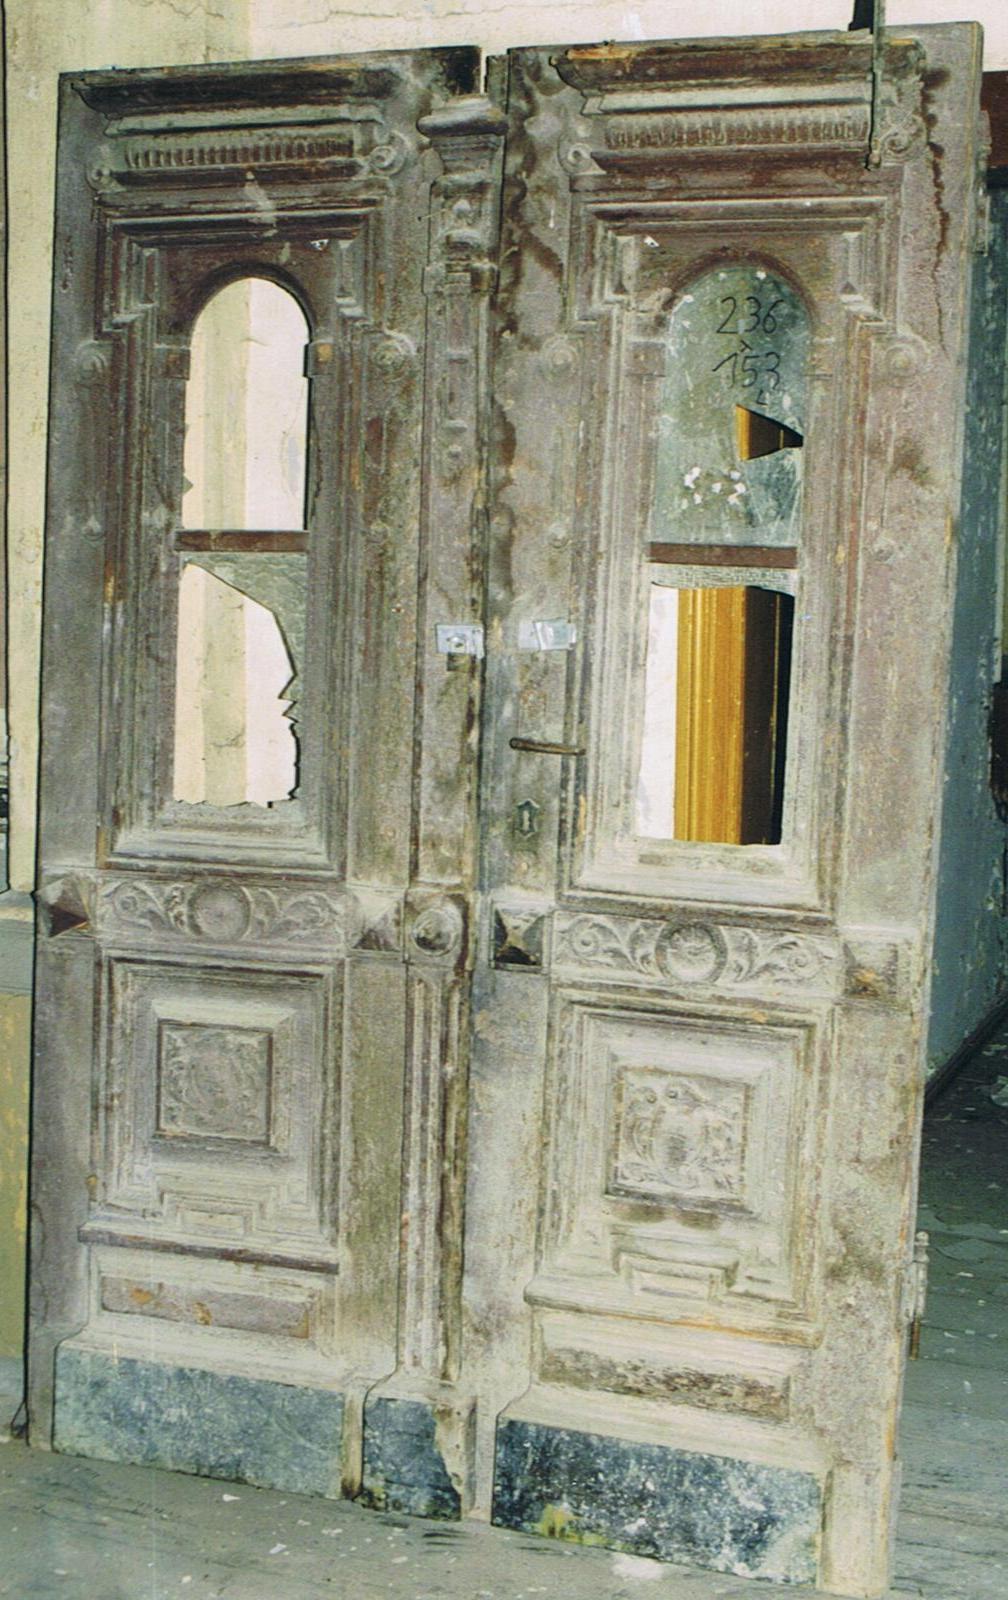 altberliner bauelemente historische antike haust ren. Black Bedroom Furniture Sets. Home Design Ideas